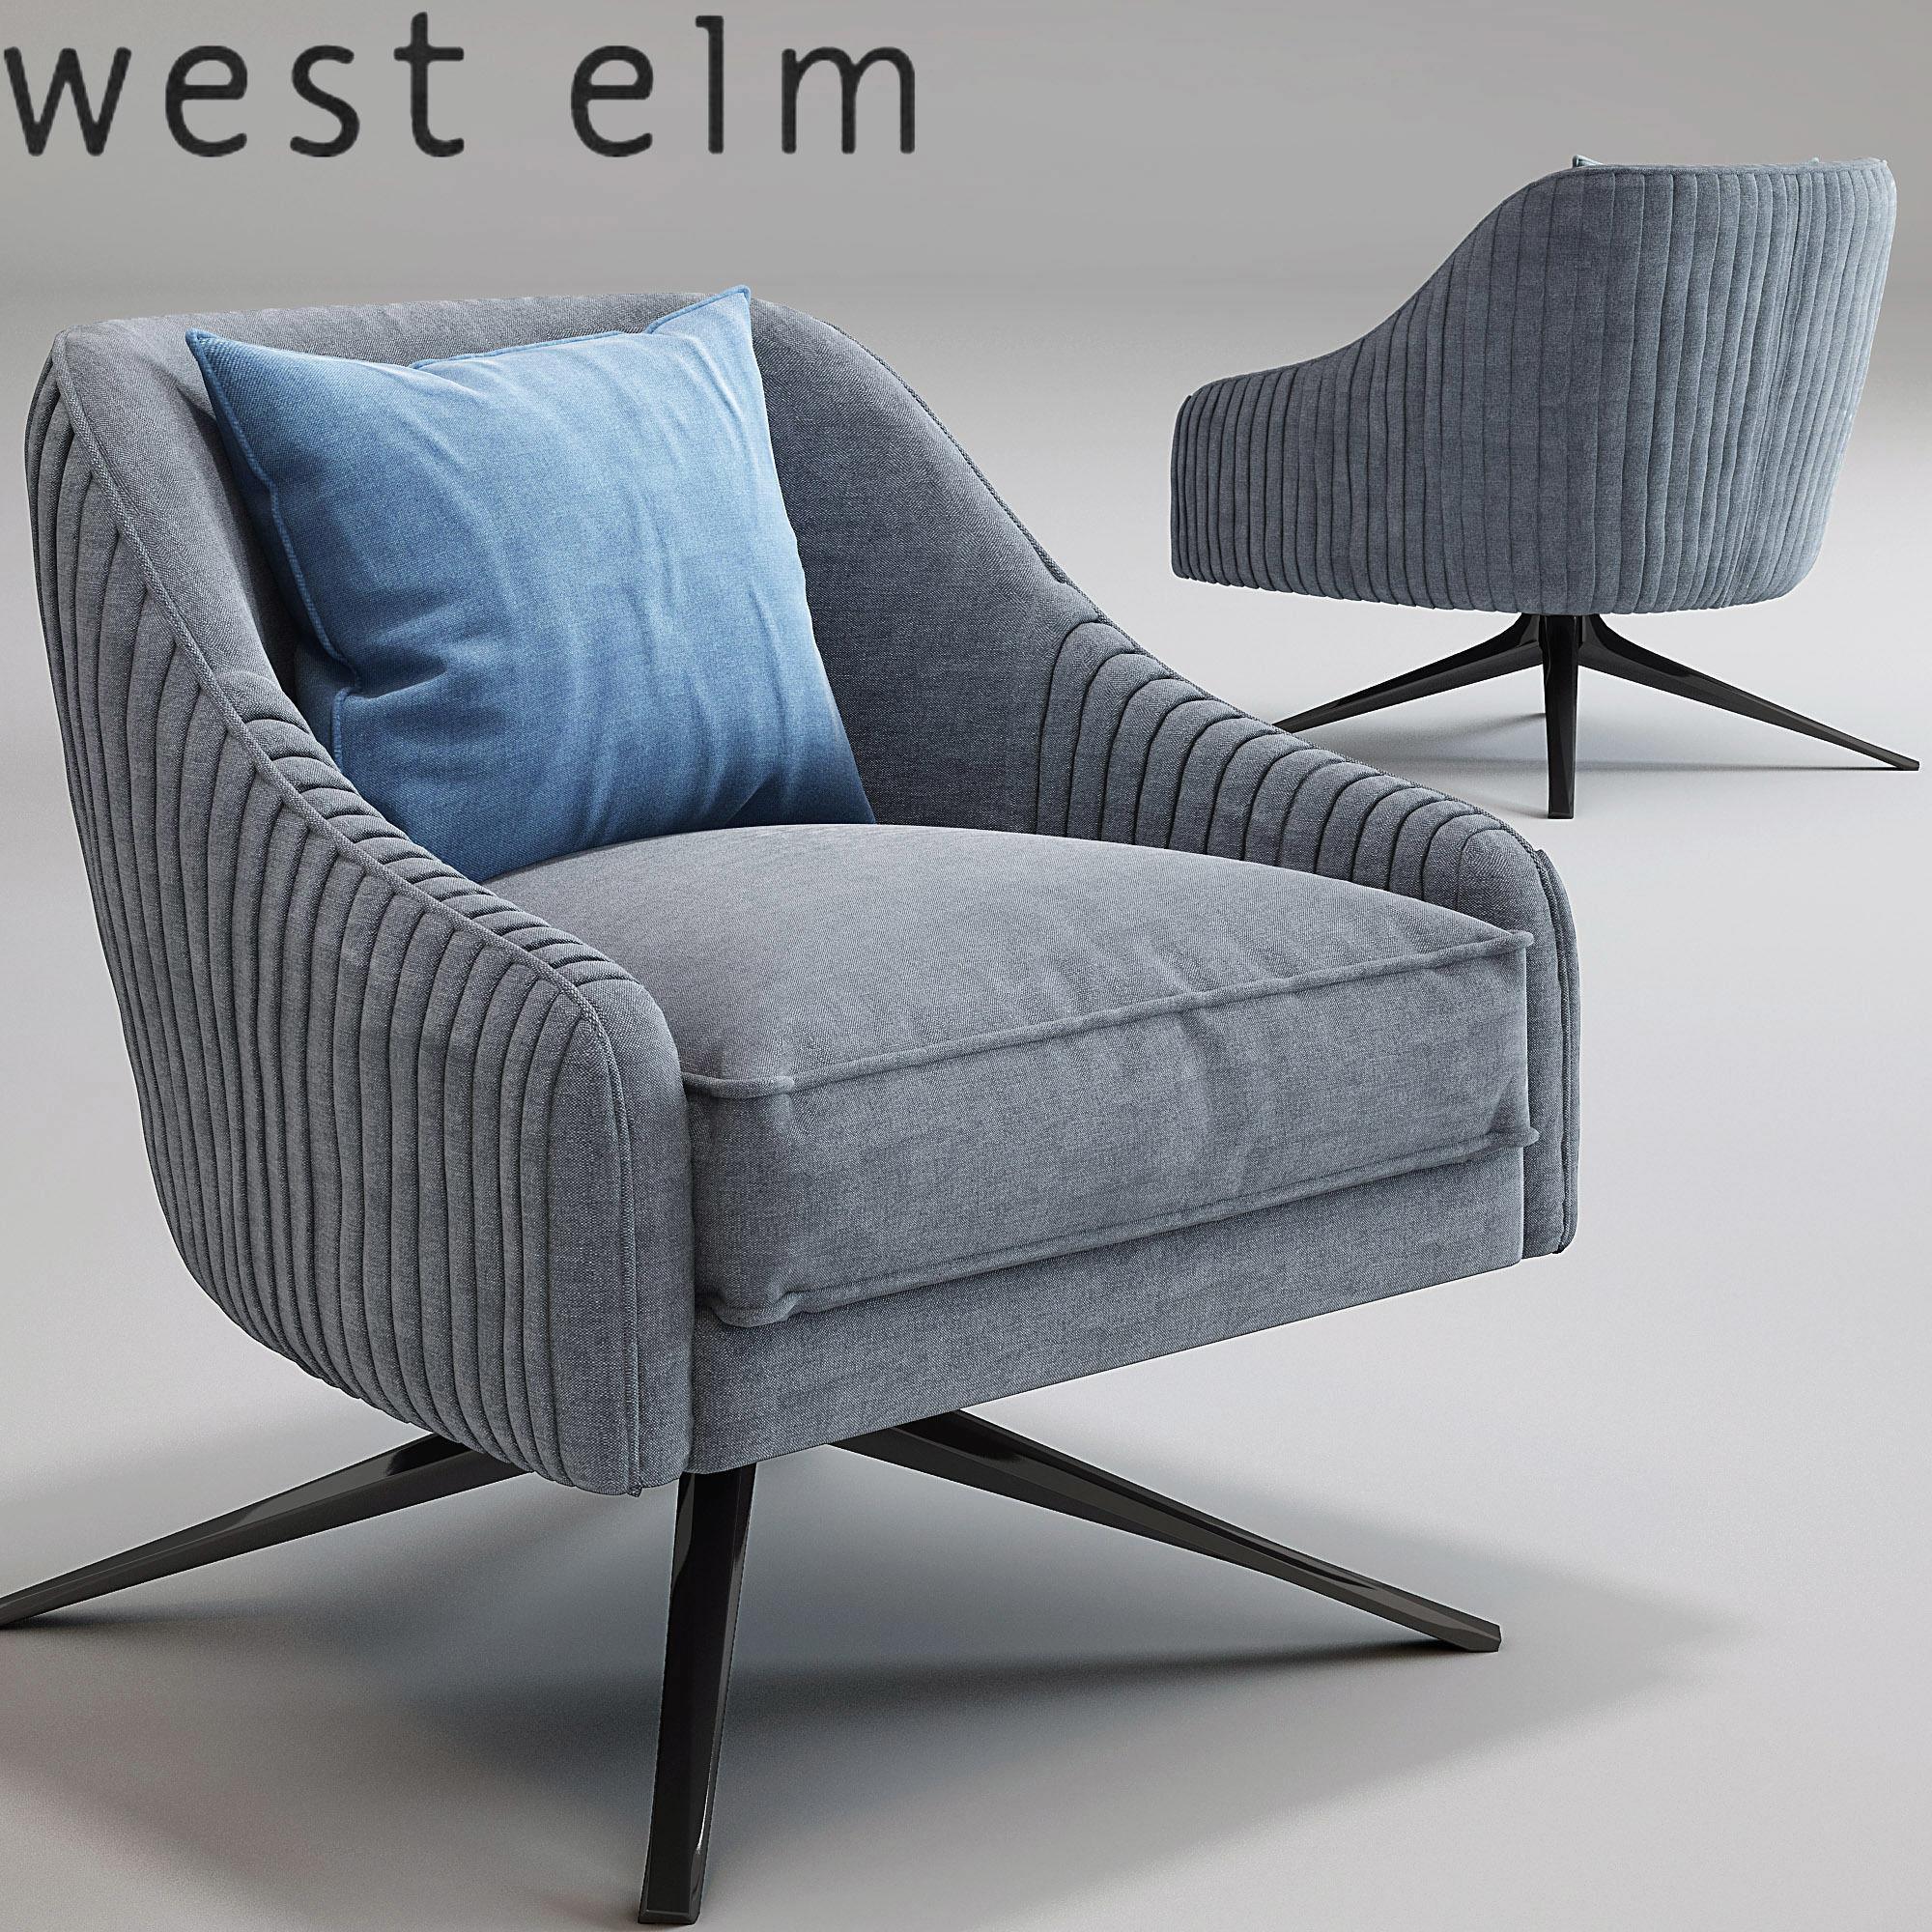 3d roar rabbit swivel chair west elm cgtrader